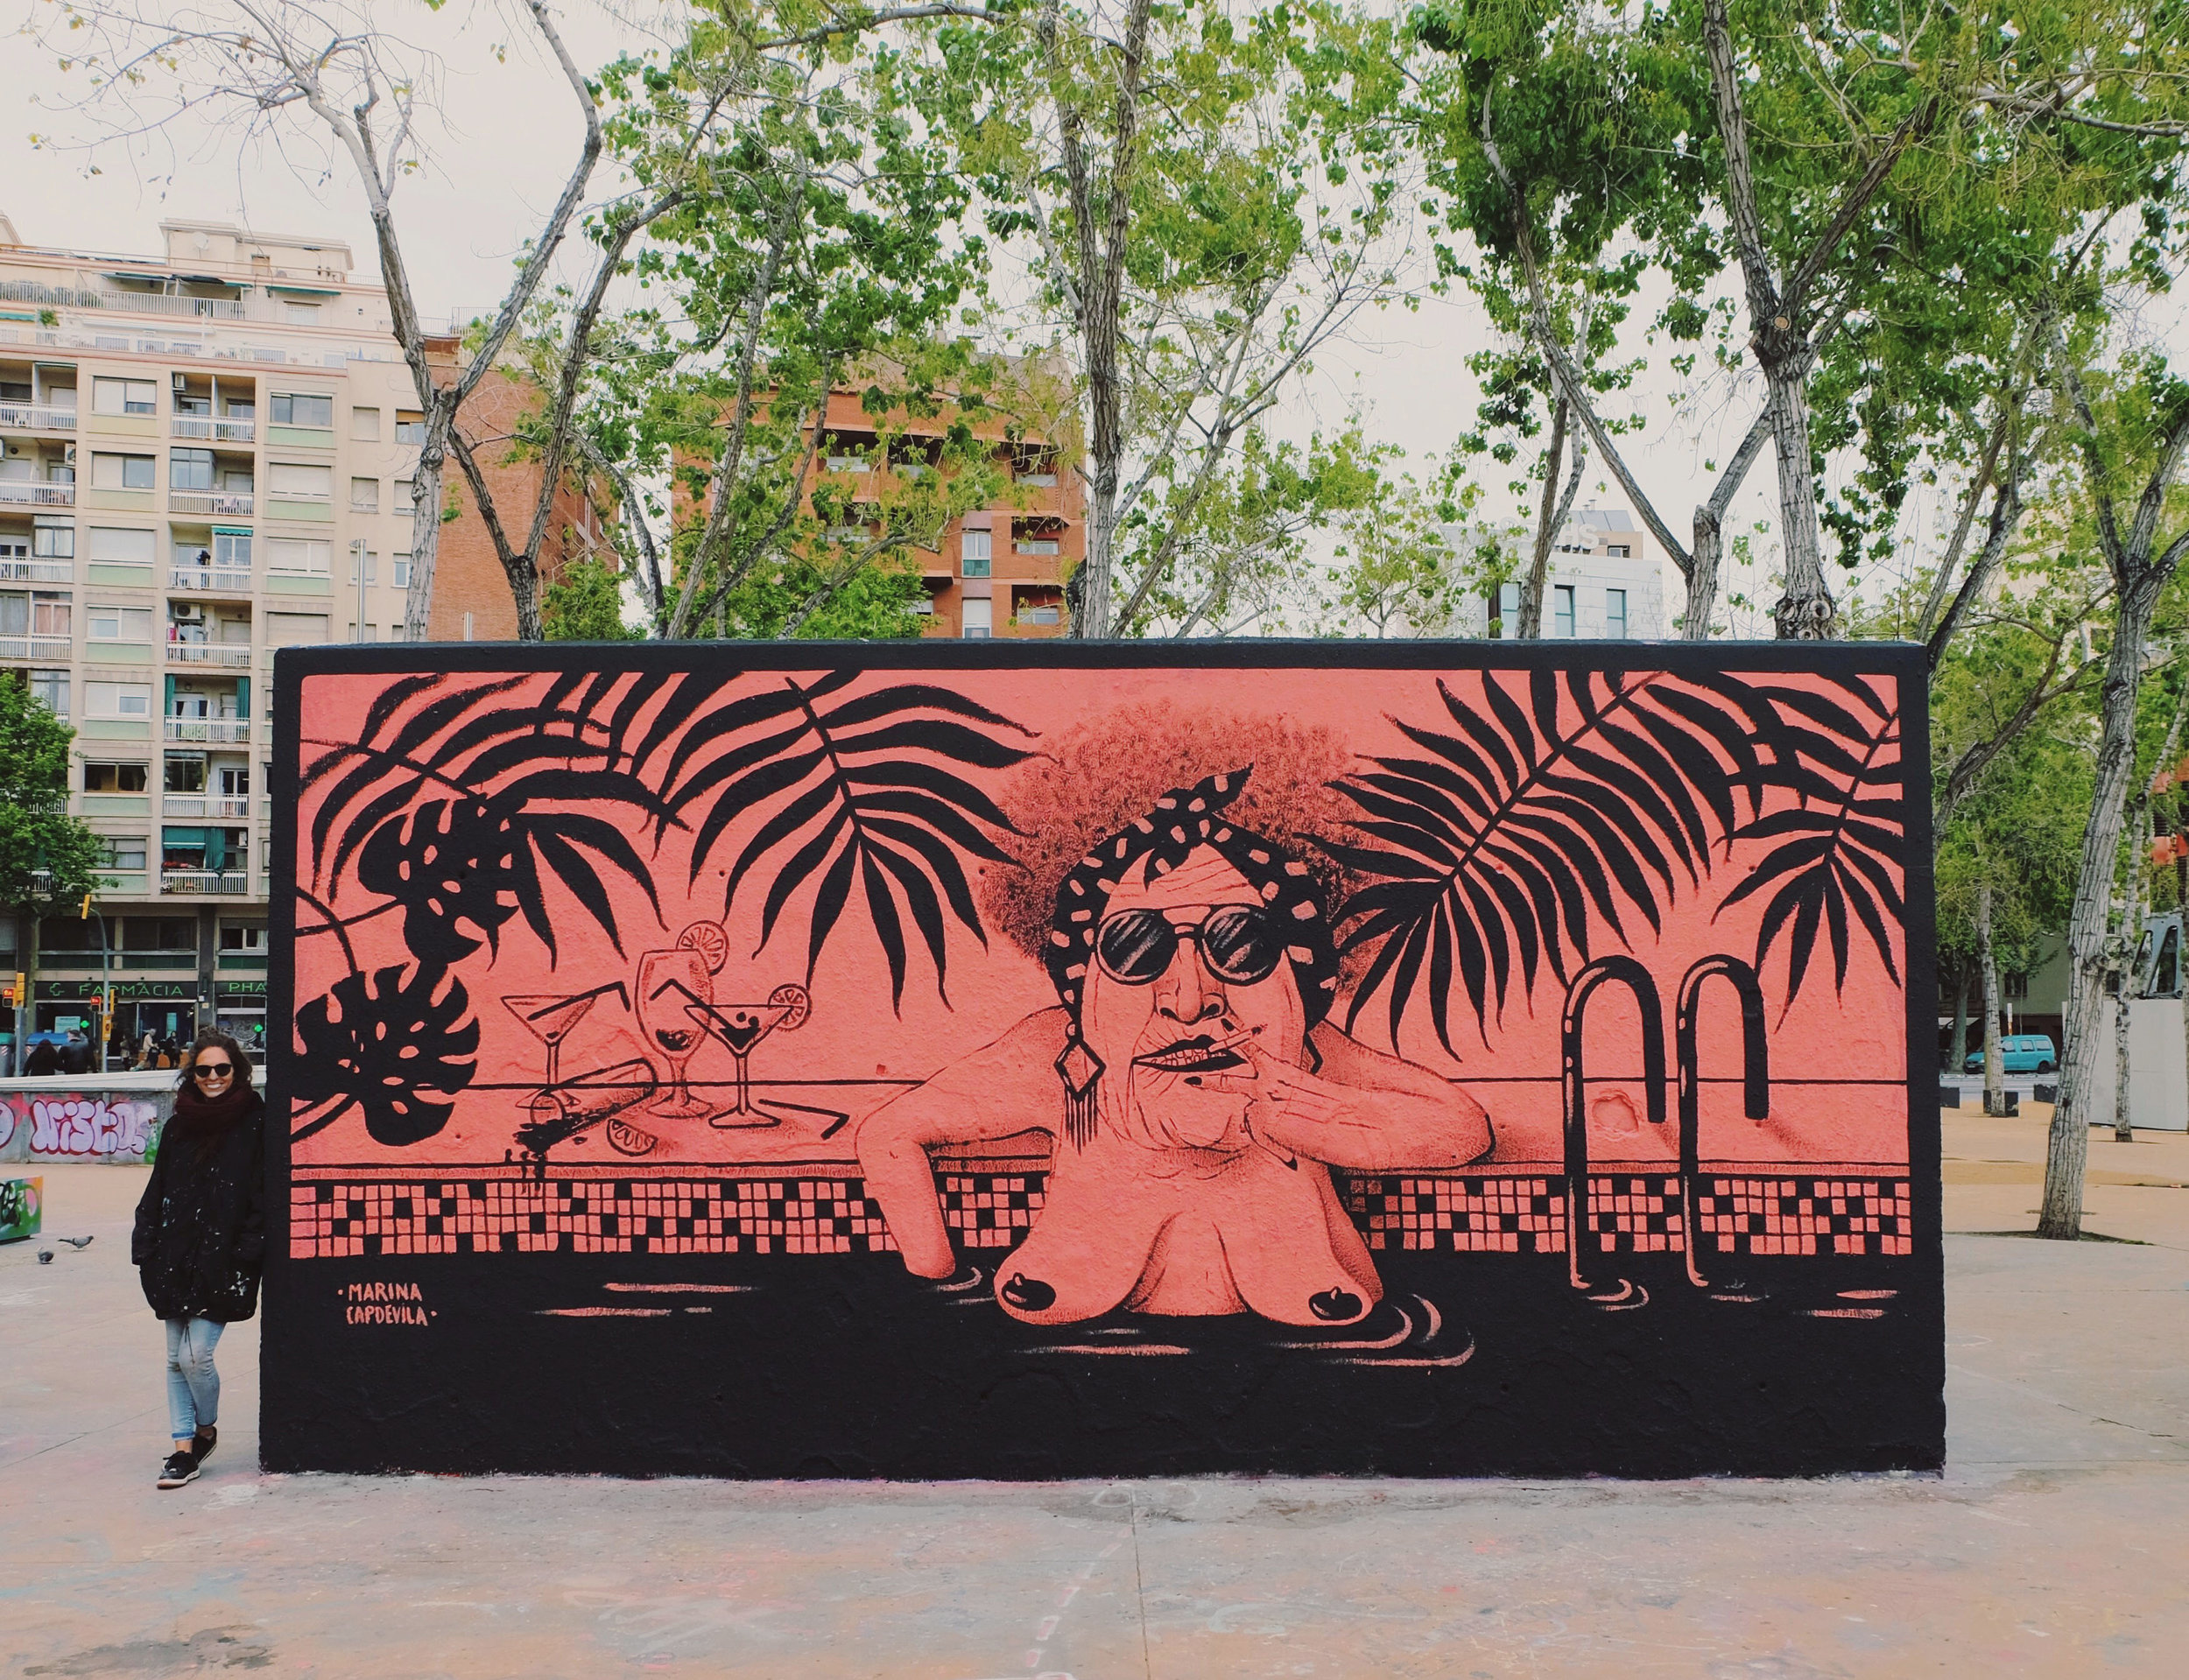 Mural painted at 3 Xemeneies Park, Barcelona 2017